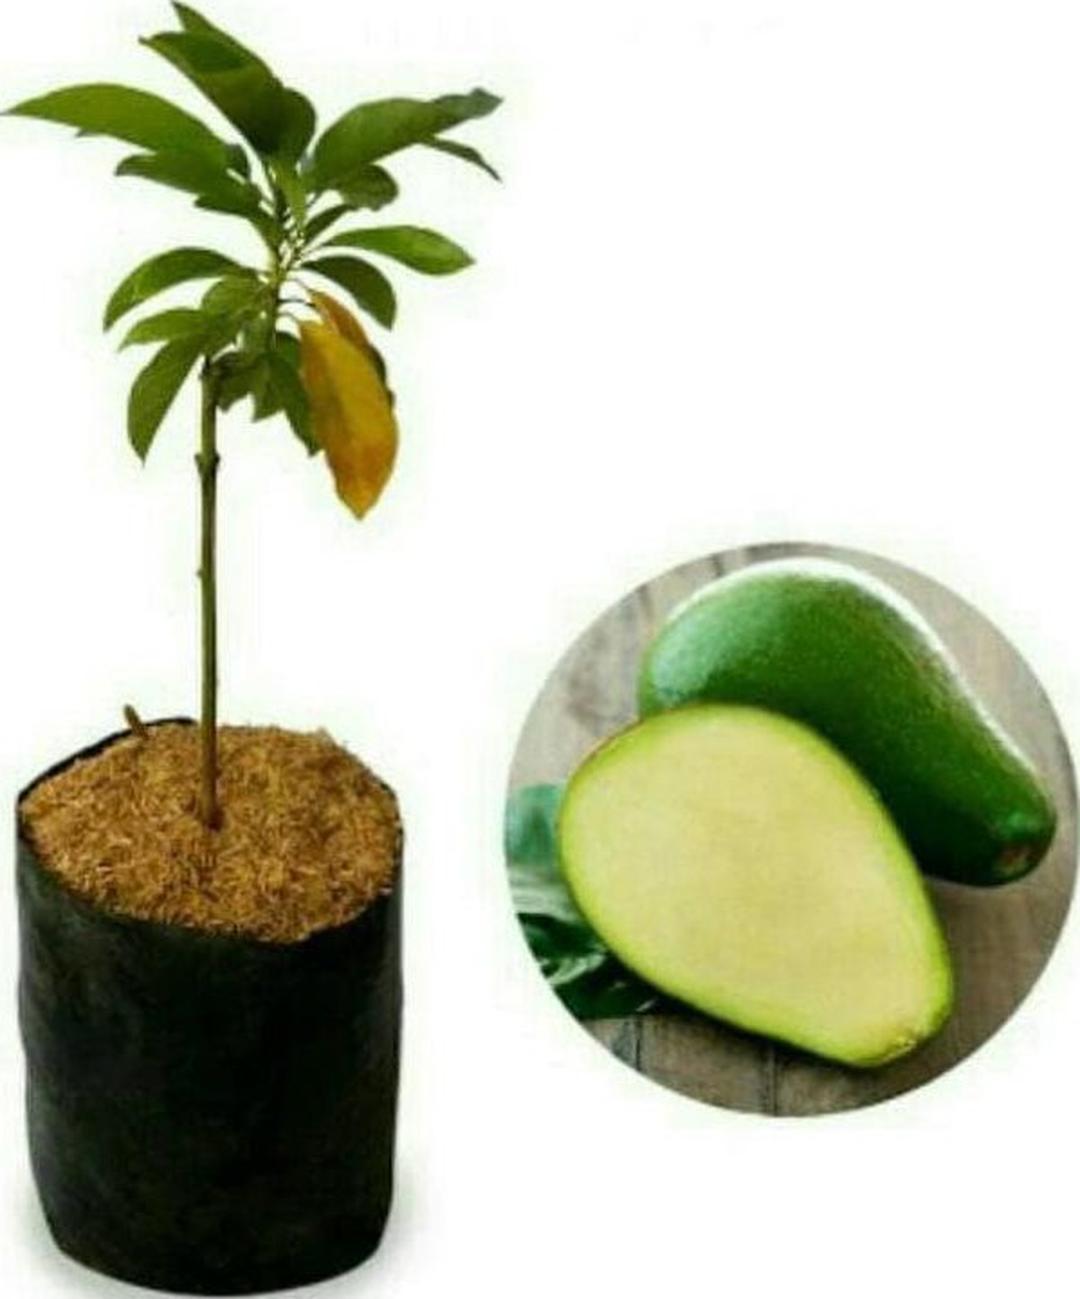 Ready! Sedia Bibit Buah Alpukat Non Atau Tanpa Biji Super Unggul Bibit Biji Gsp Kota Bogor #jual bibit buah buahan